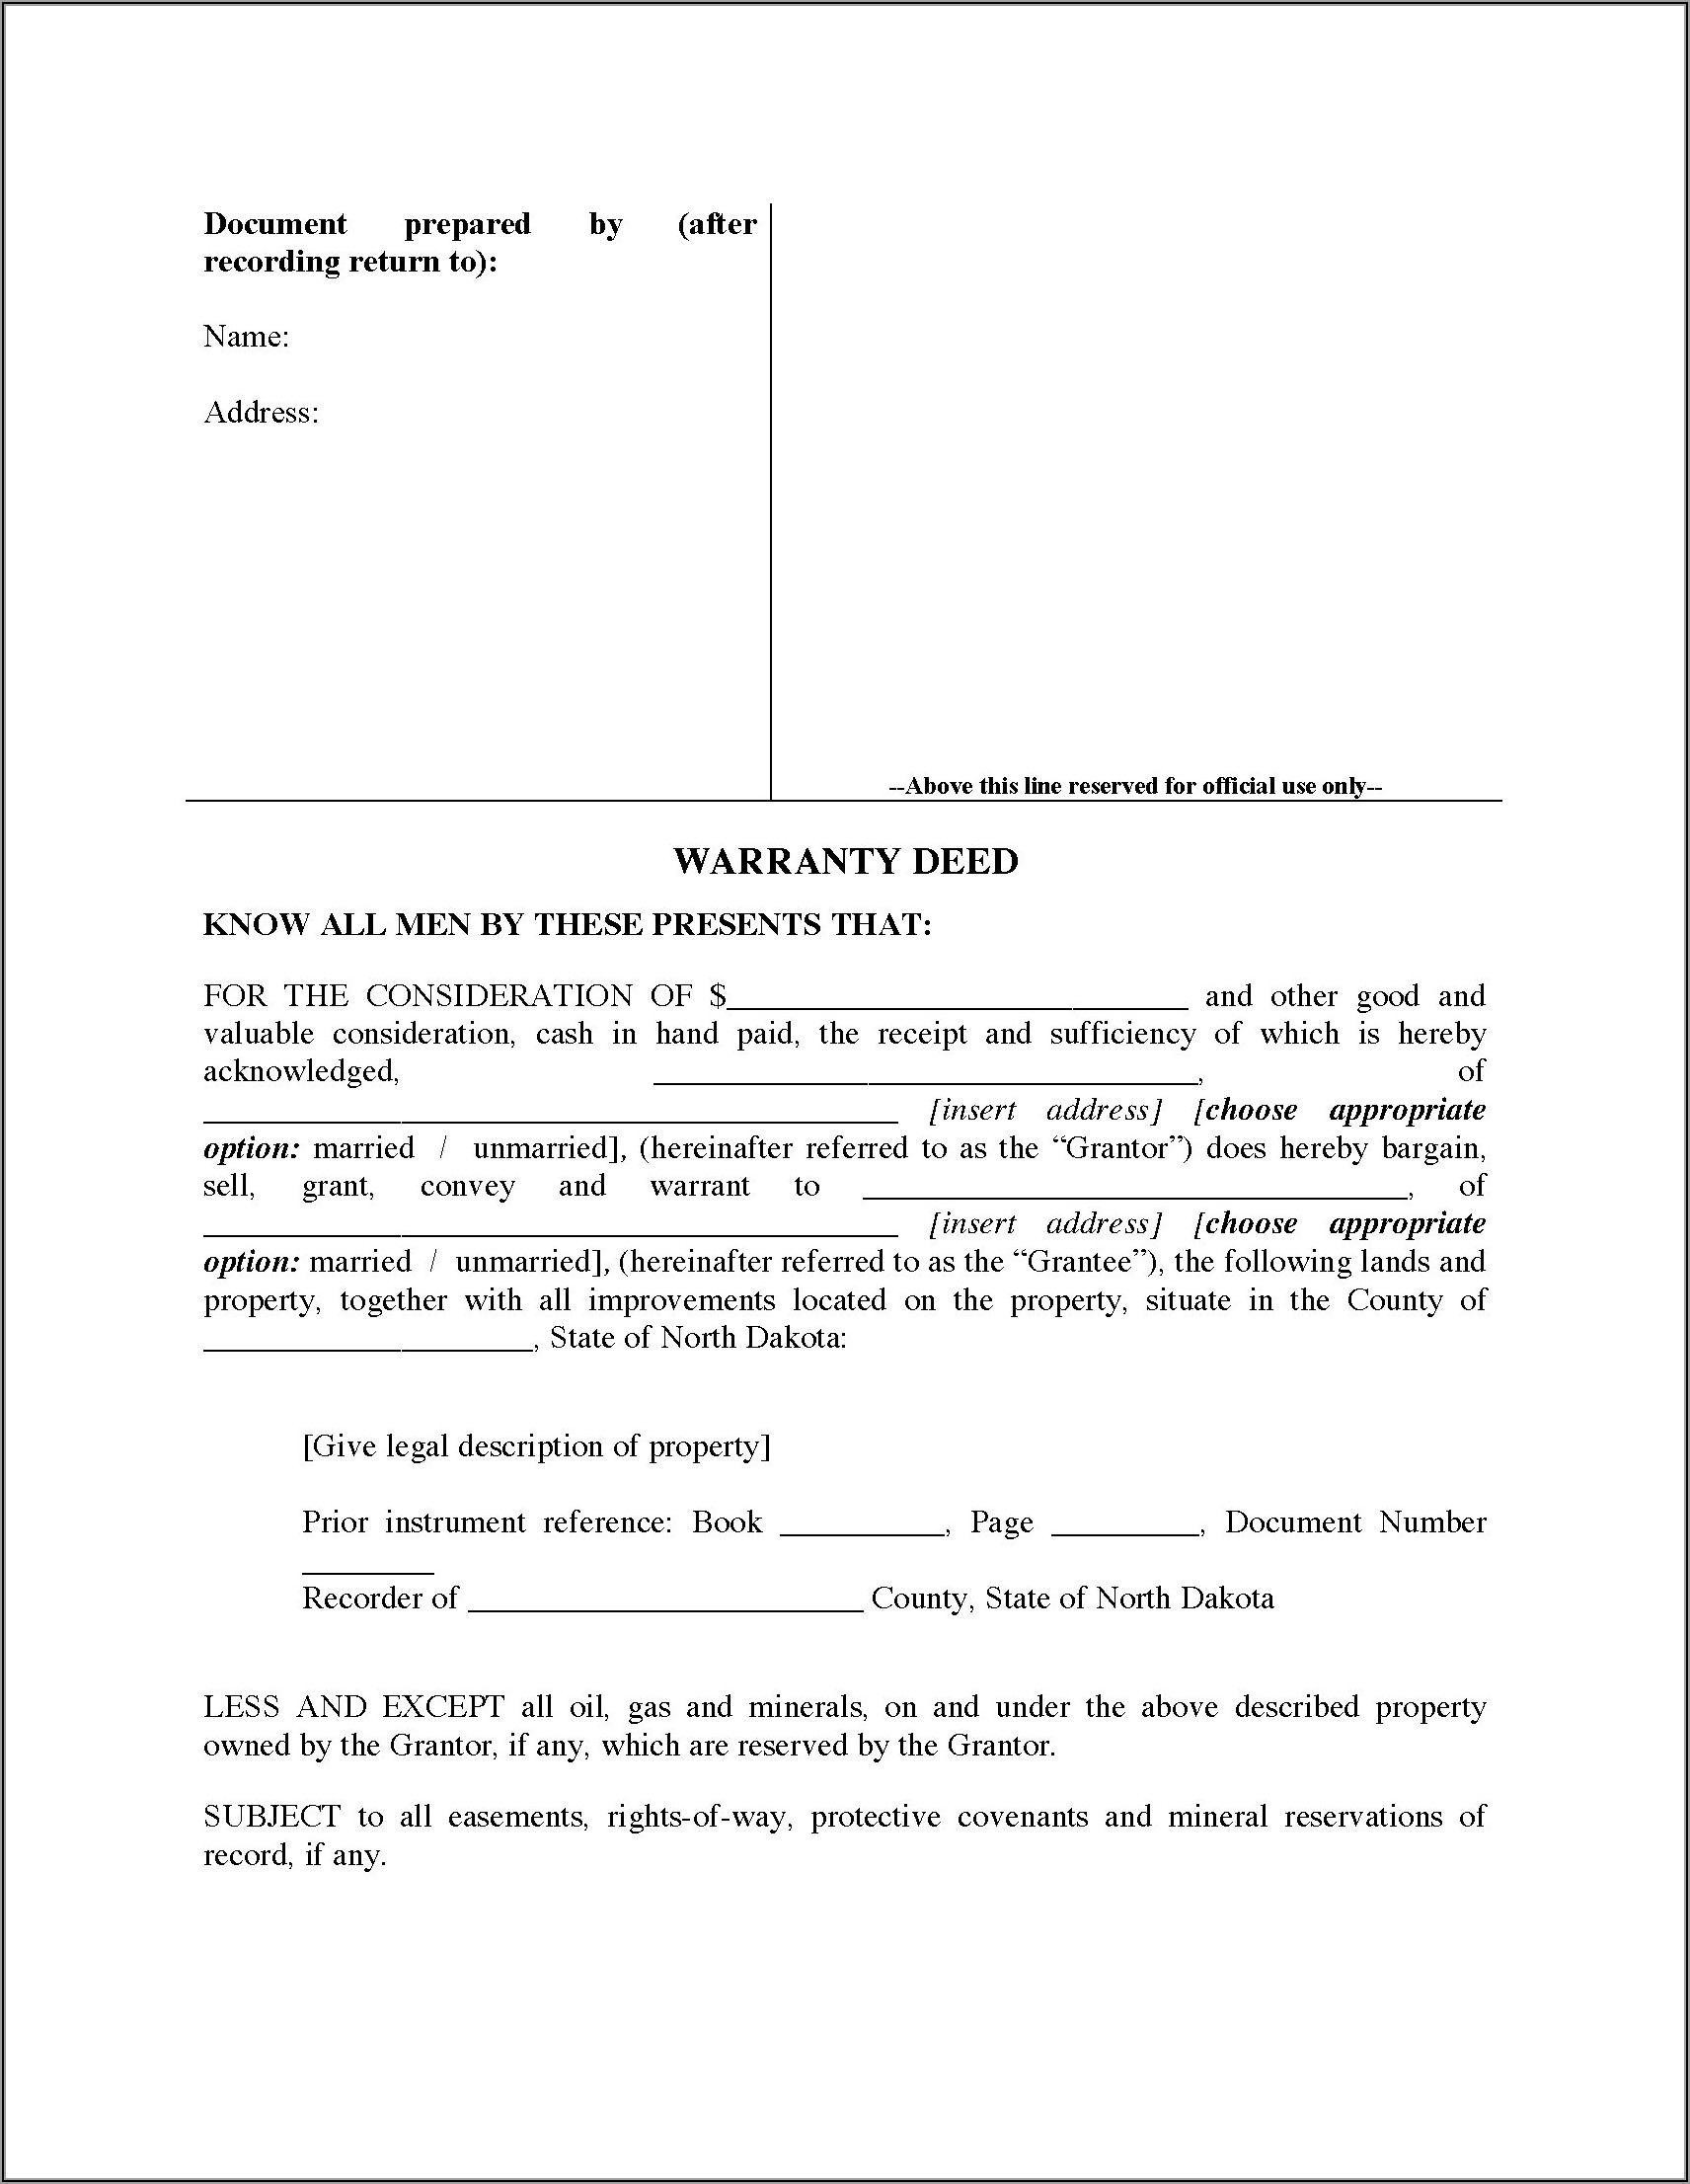 North Dakota Warranty Deed Forms Free